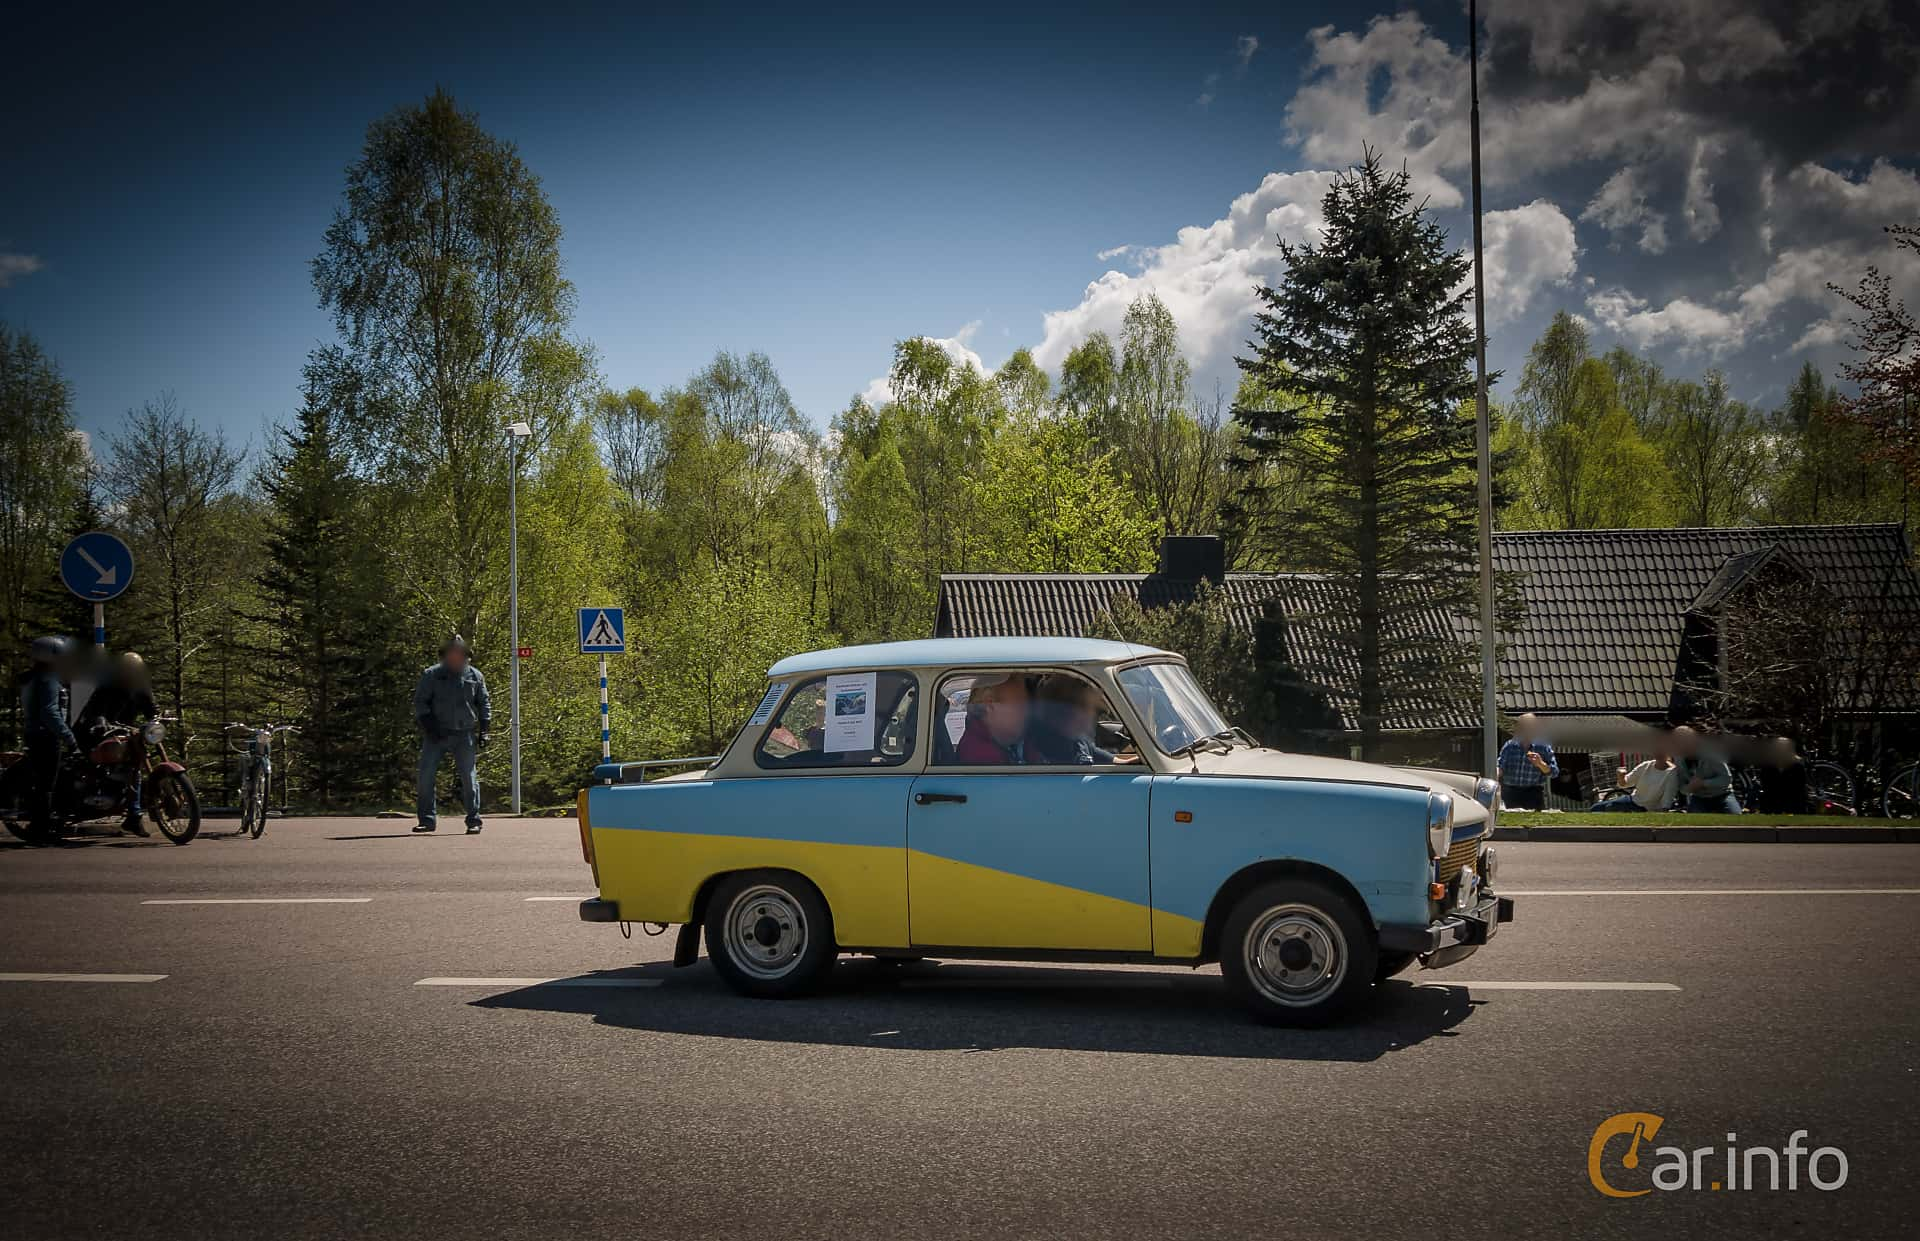 Trabant 601 Limousine 0.6 Manual, 26hp, 1987 at Riksettanrallyt 2015